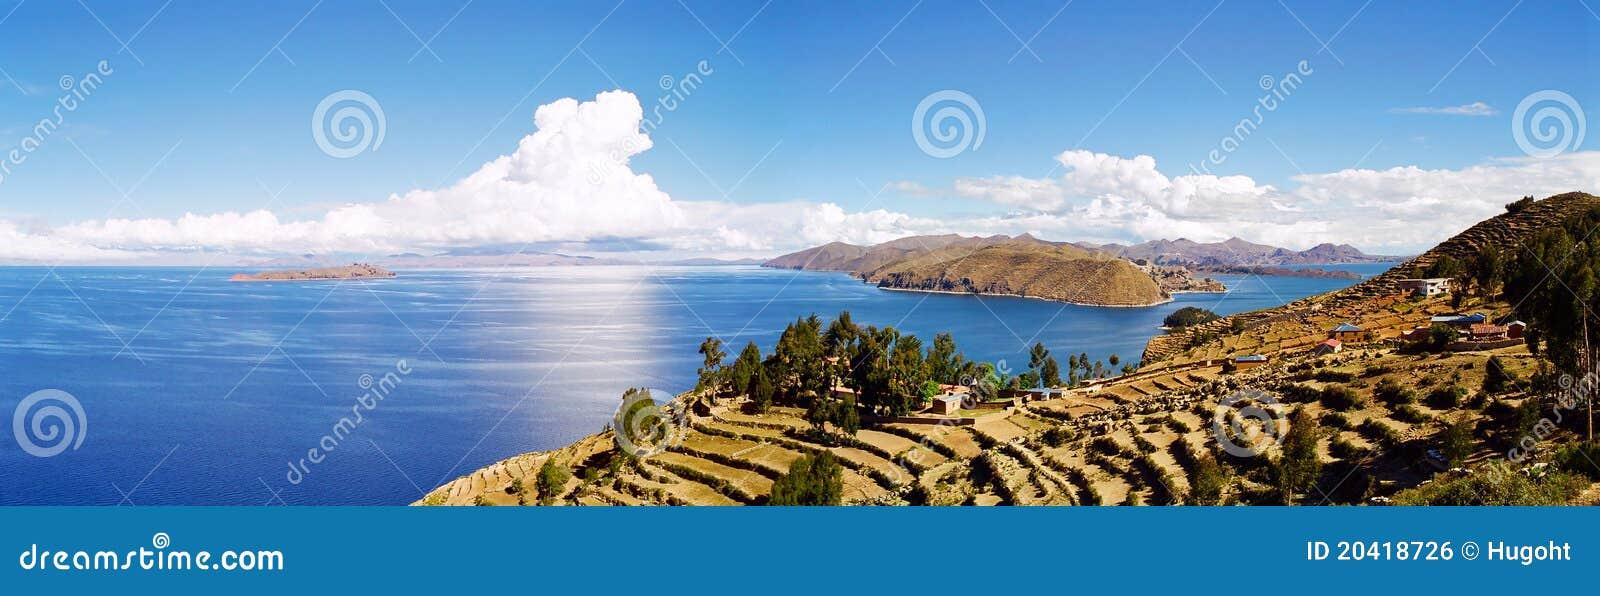 Lago Titicaca, Bolívia Peru